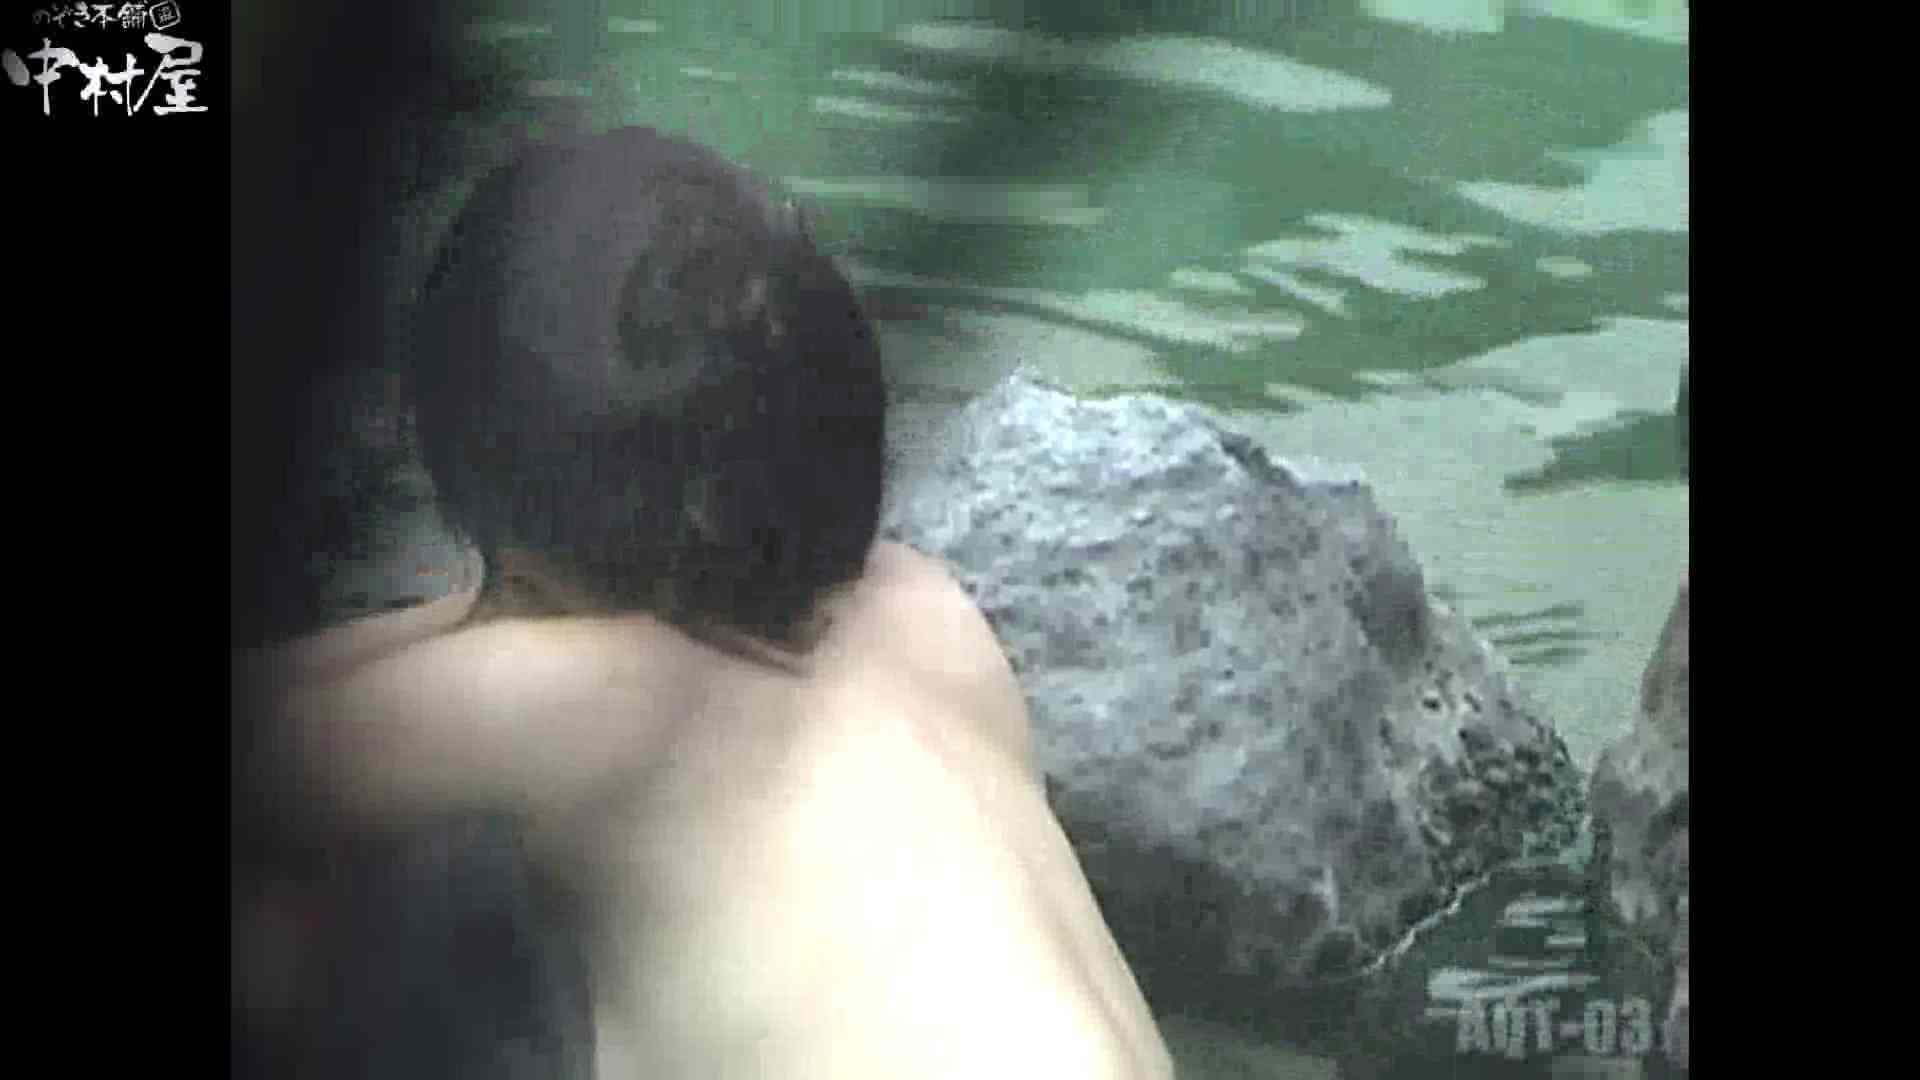 Aquaな露天風呂Vol.867潜入盗撮露天風呂参判湯 其の一 盗撮 | 潜入シリーズ  88pic 44